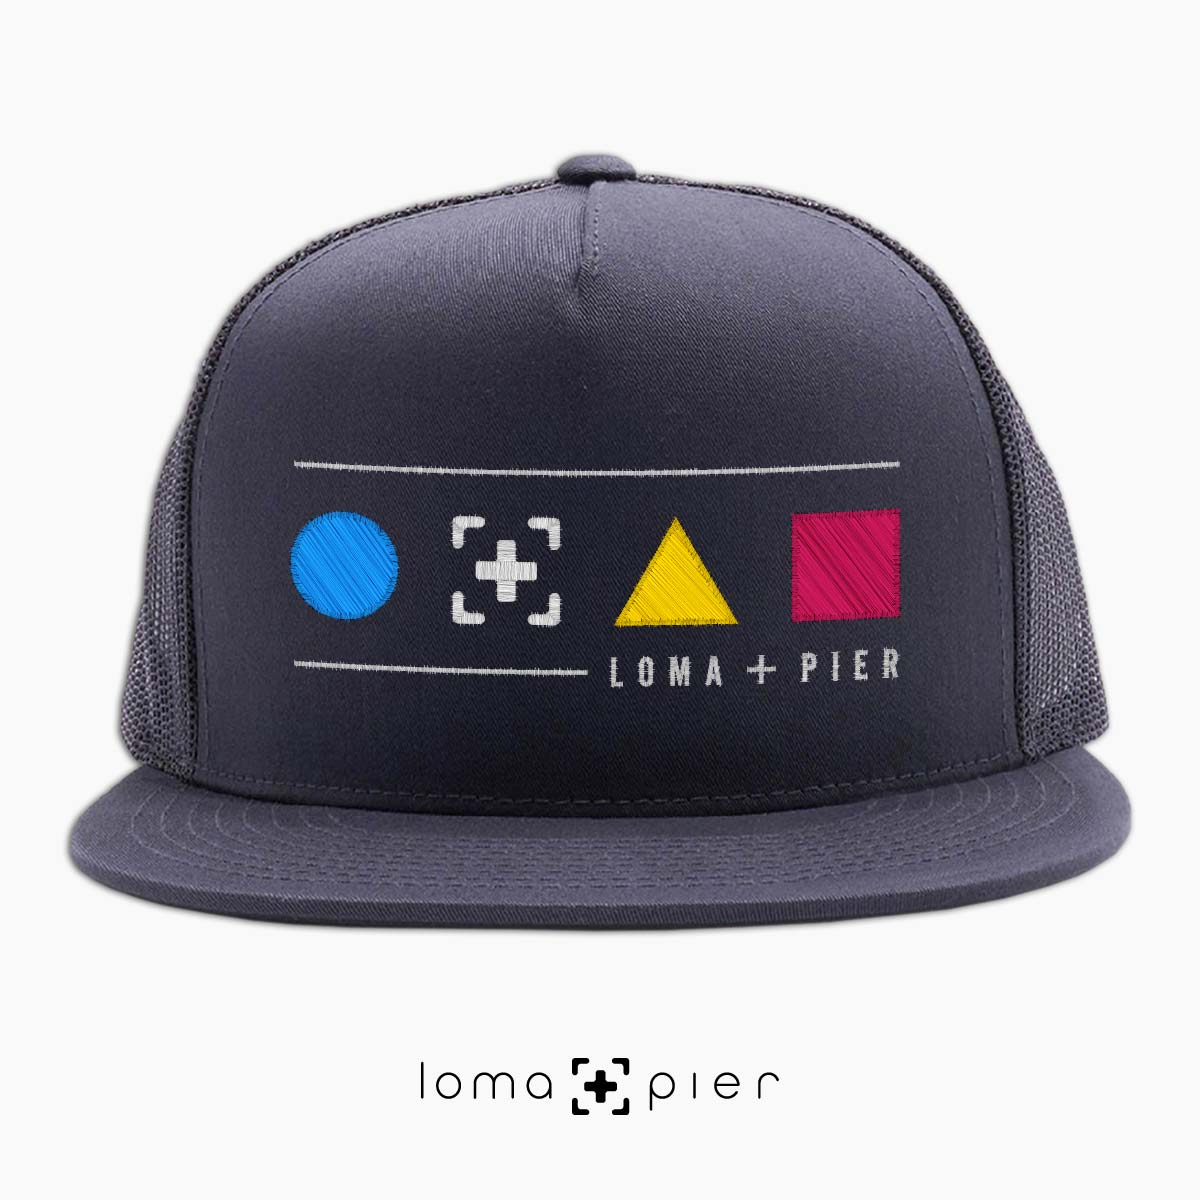 neon shapes beach trucker hat in charcoal by lomapier hat store